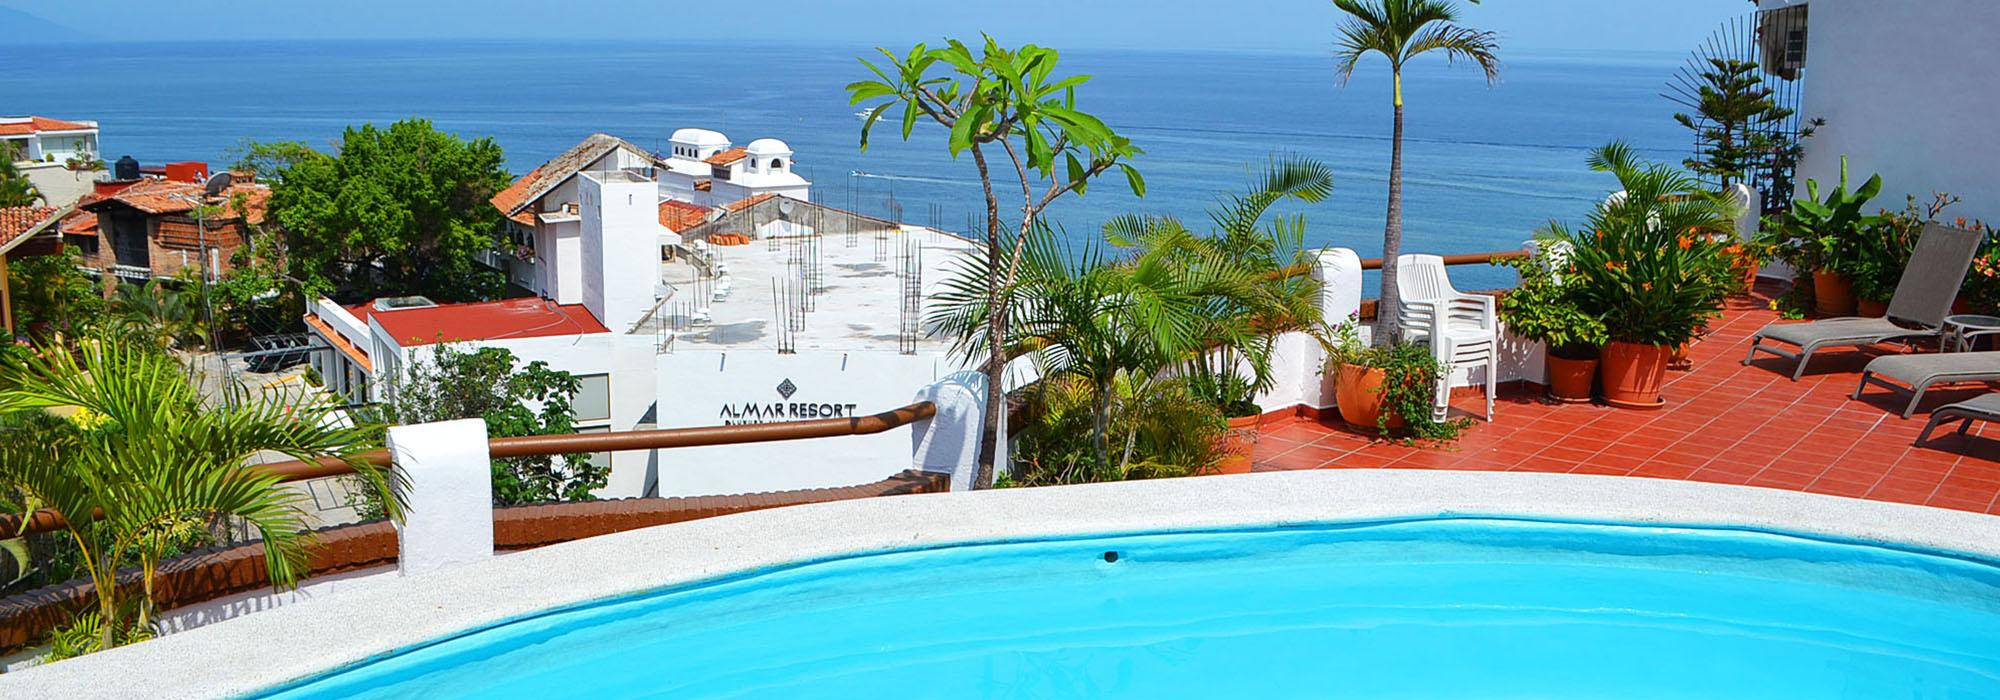 Home vallarta dream rentals for Dream home rentals